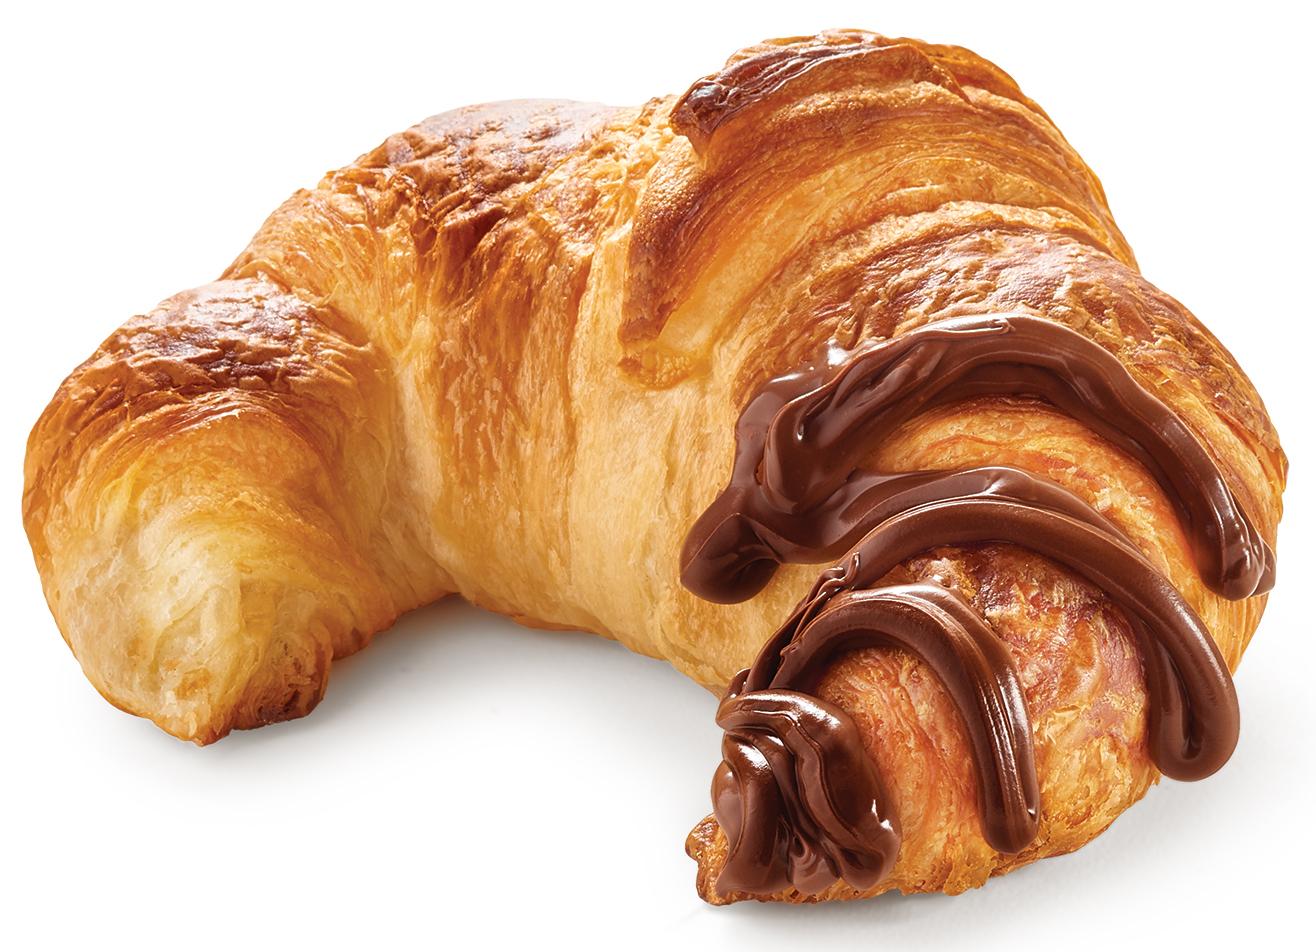 Spreads-Croissant-Choc3.jpg